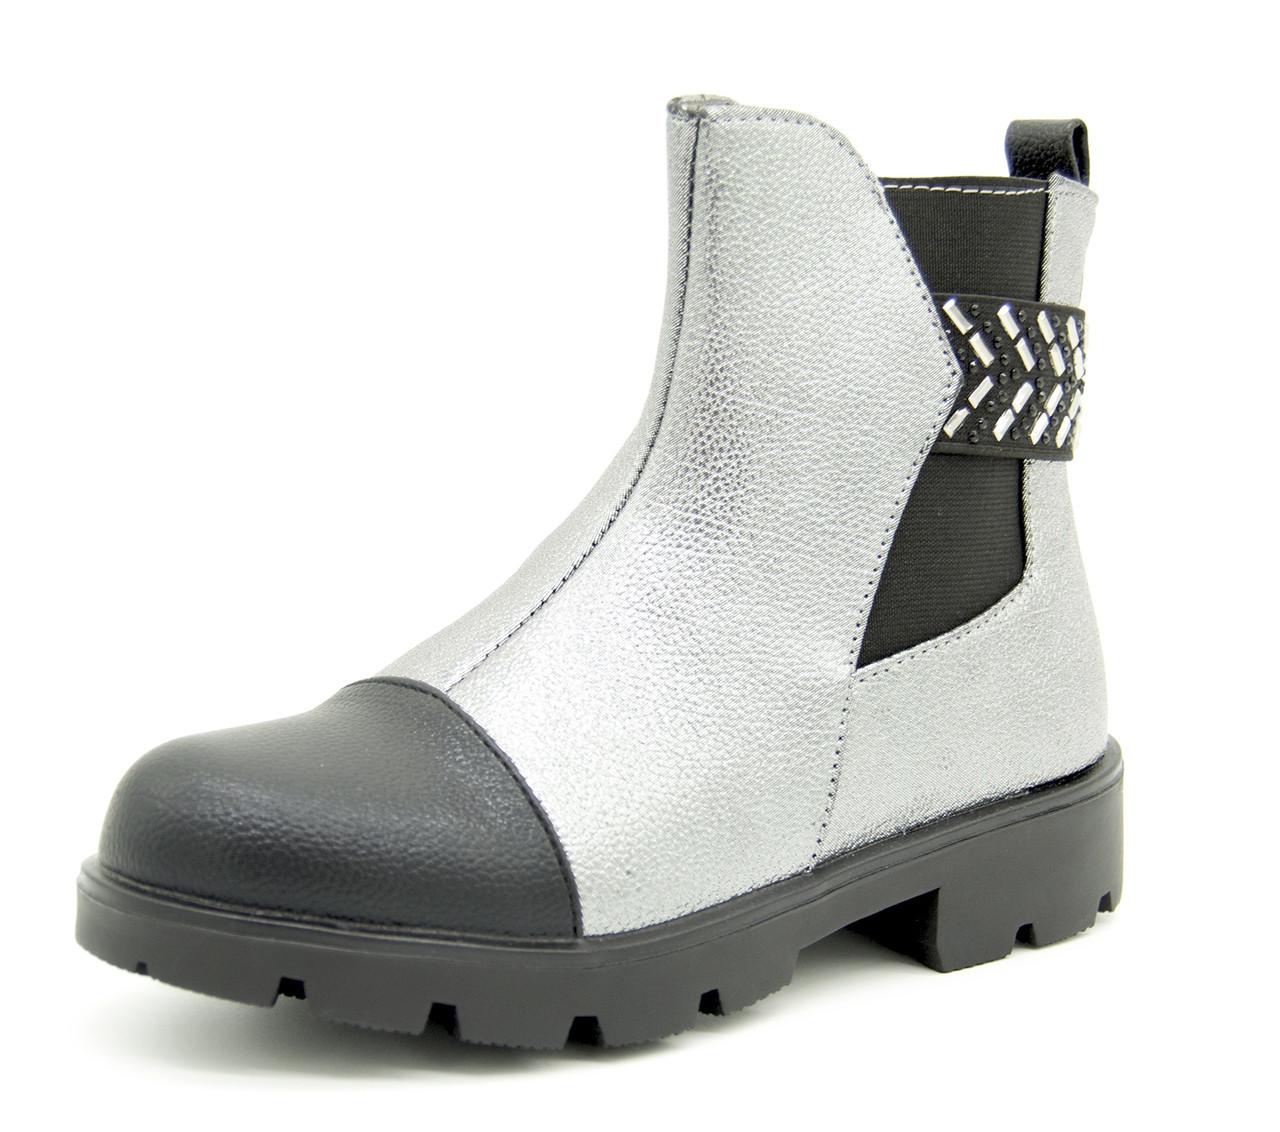 Демисезонные ботинки Kimbo FG98-3C silver 34 (21,5 см) (RO1225559)